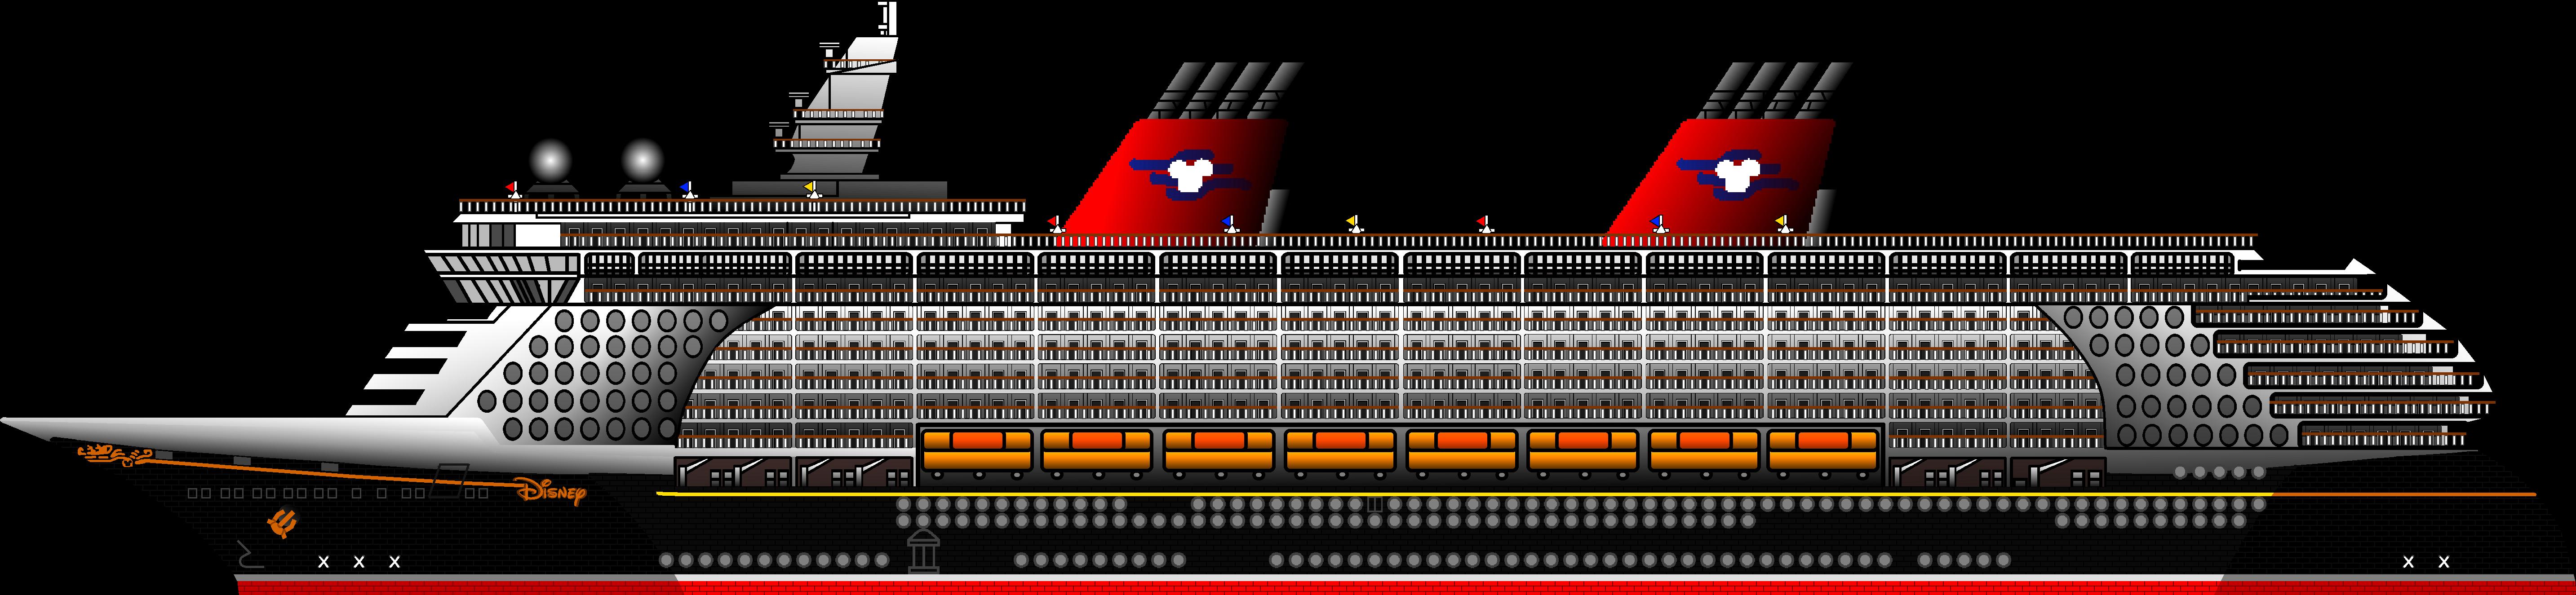 5733x1325 Fantasy Cruise Ship By Ryanh1984